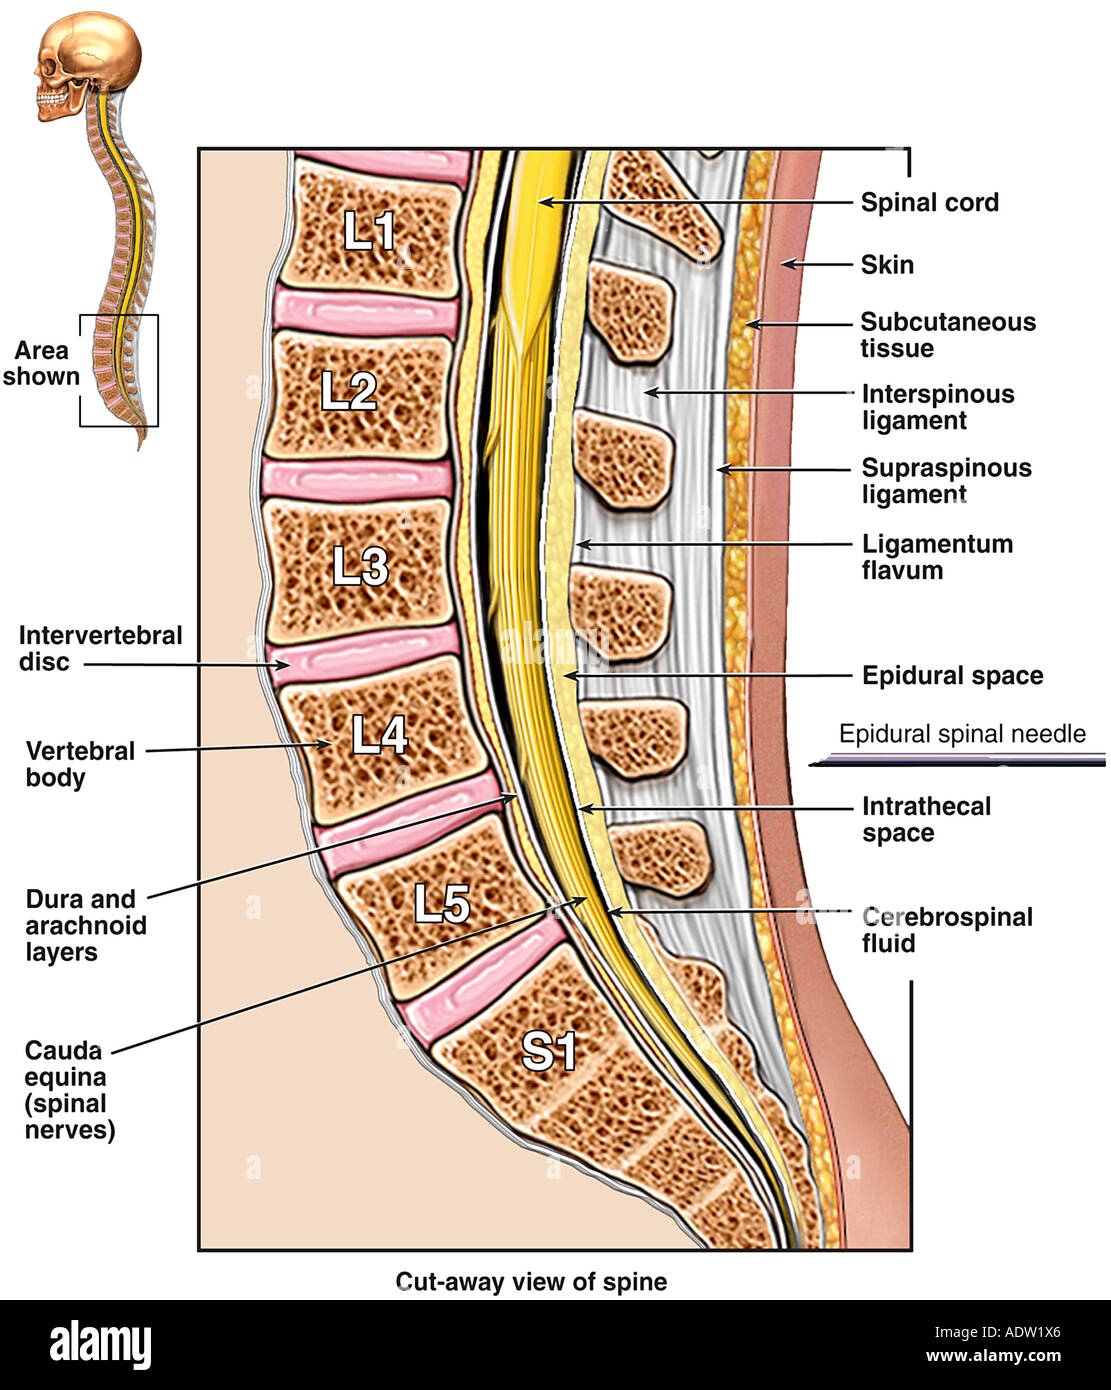 Anatomie der lumbosakralen Wirbelsäule Stockfoto, Bild: 7711333 - Alamy